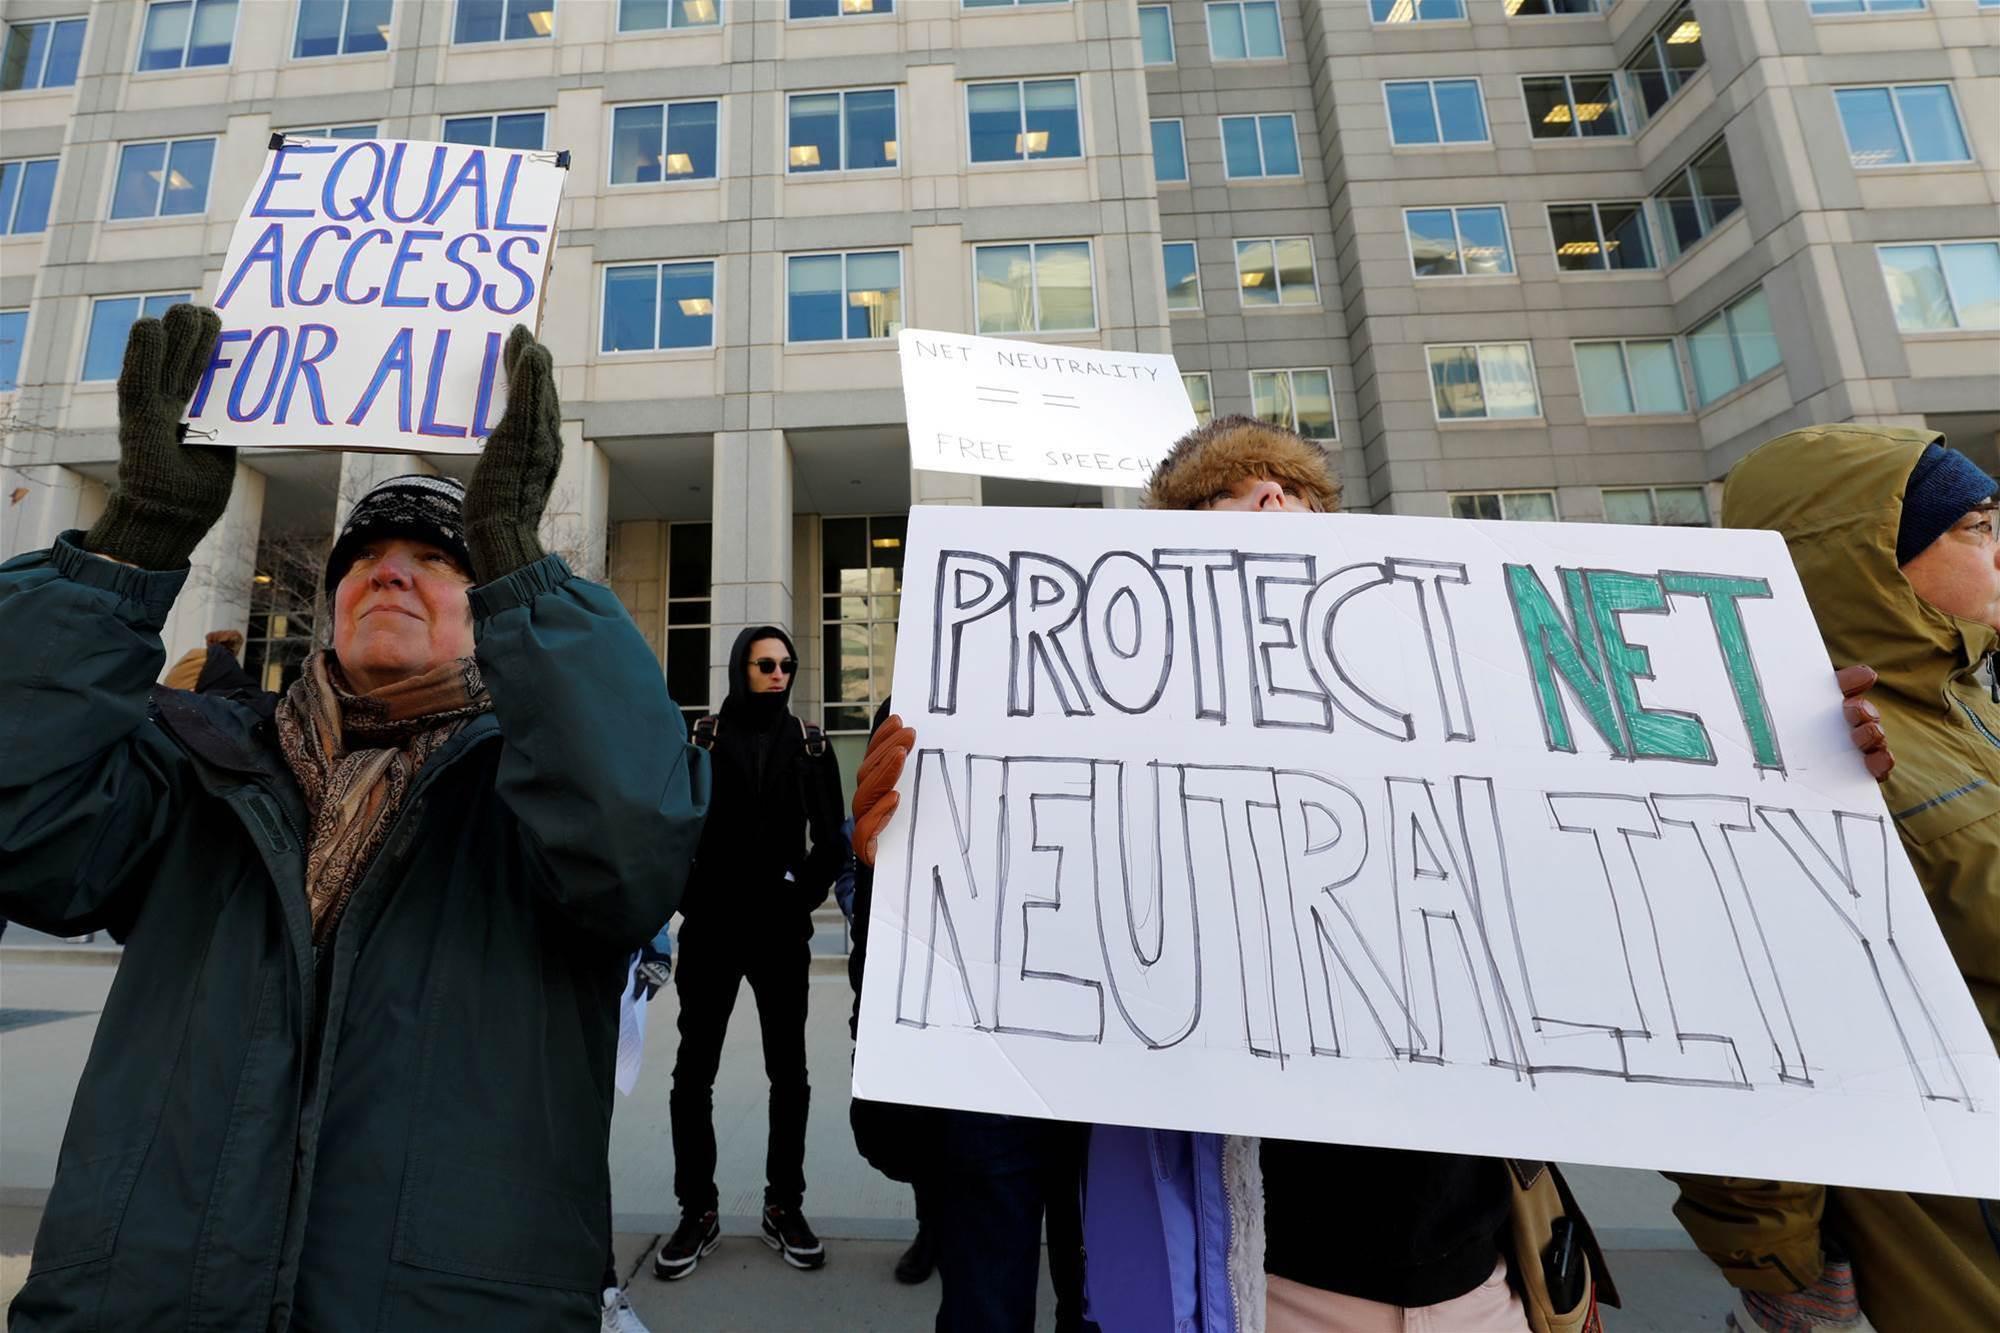 US House approves net neutrality bill but legislation faces long odds